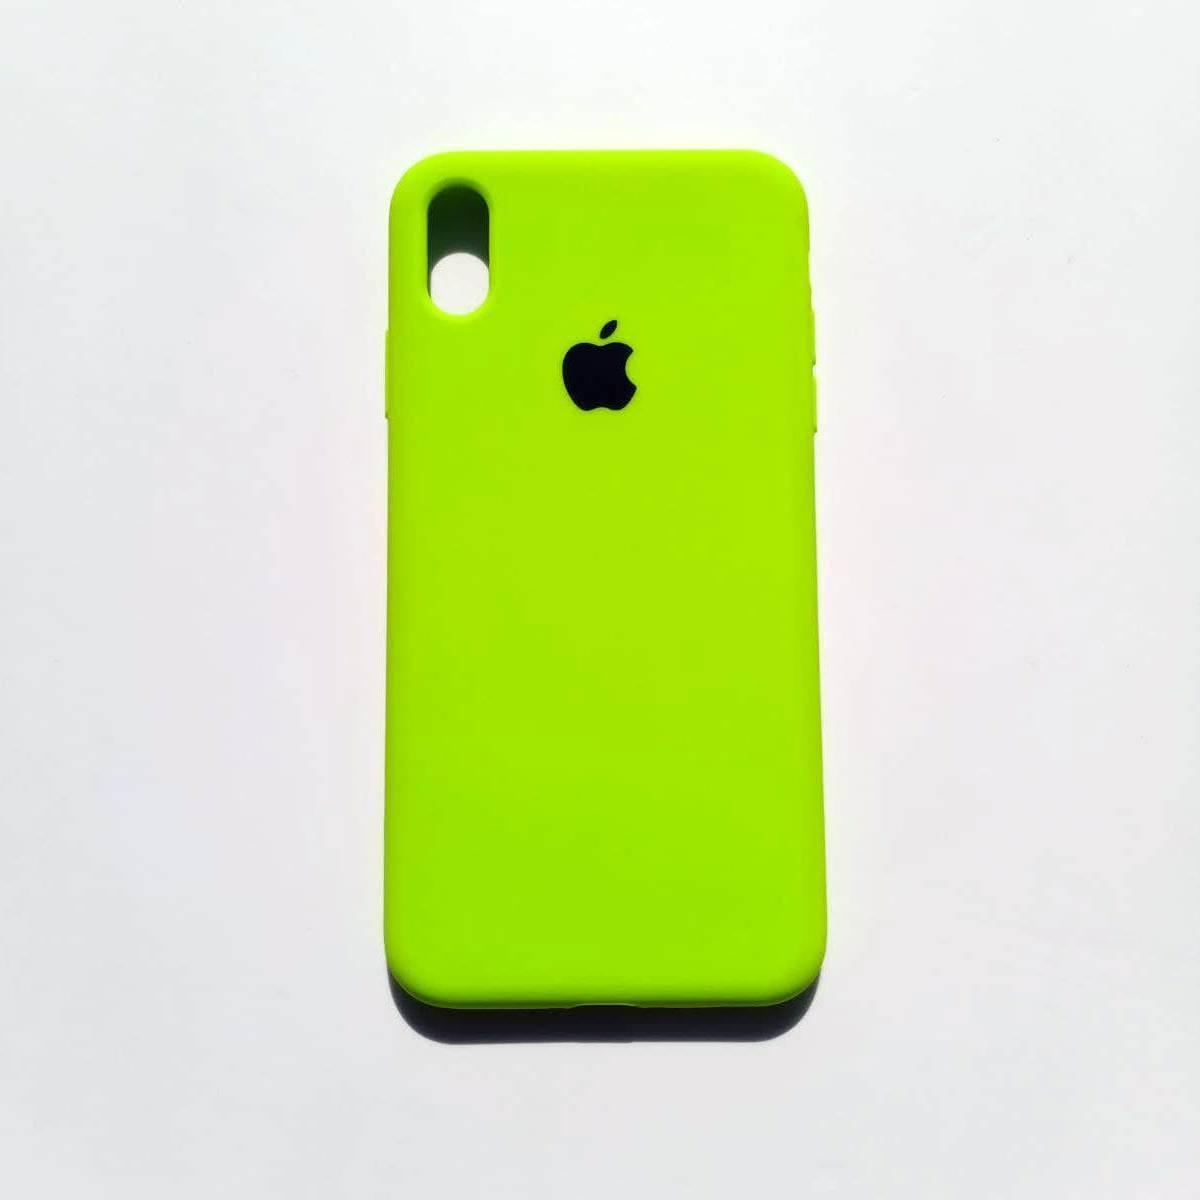 Чохол-накладка Silicone Case для Apple iPhone XS Max Neon Green